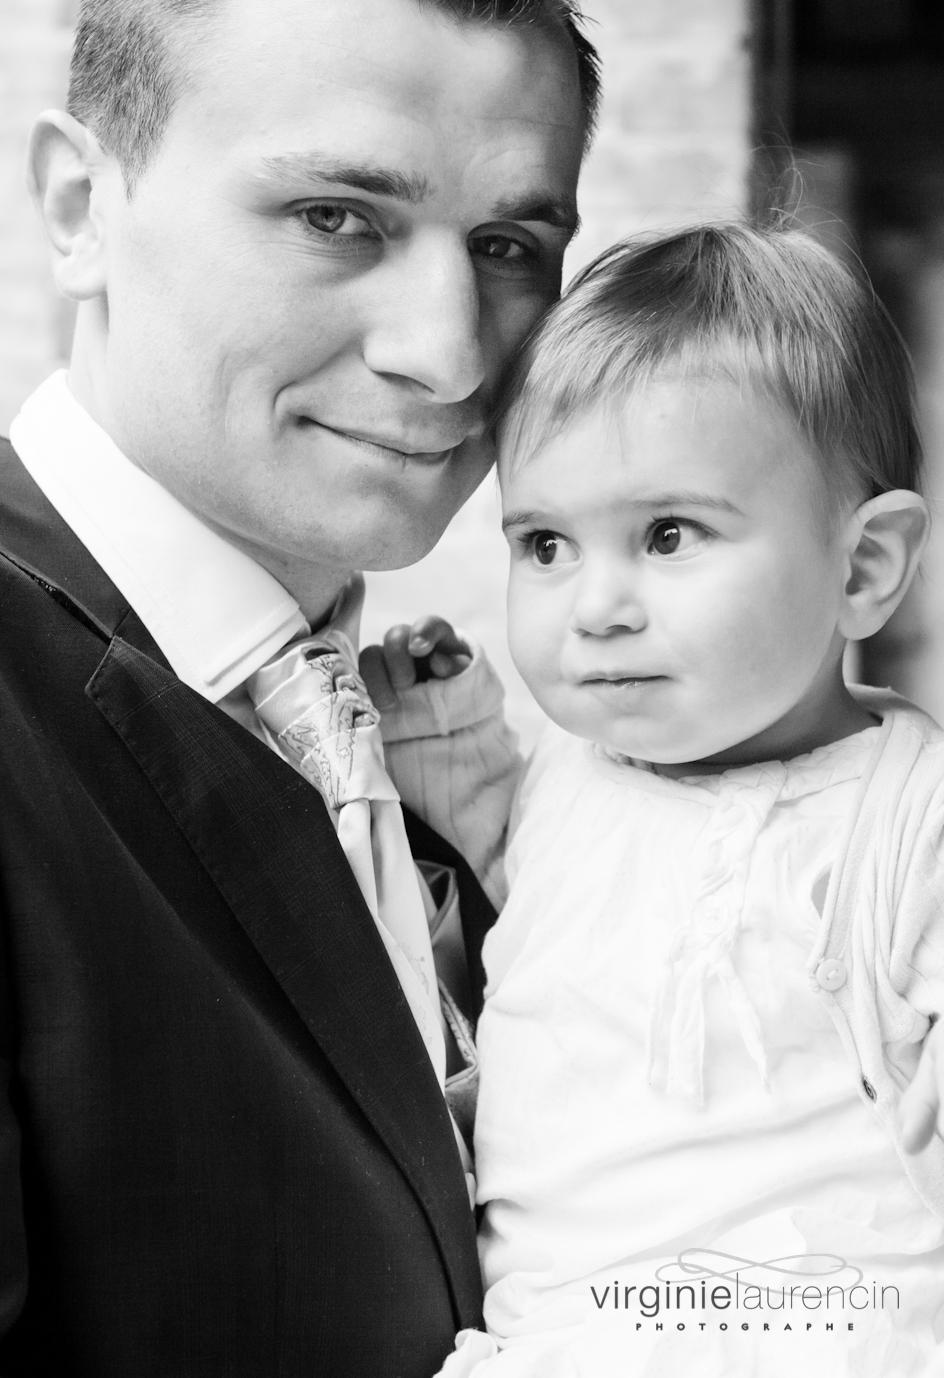 Virginie Laurencin Photographe mariage CetJB_28